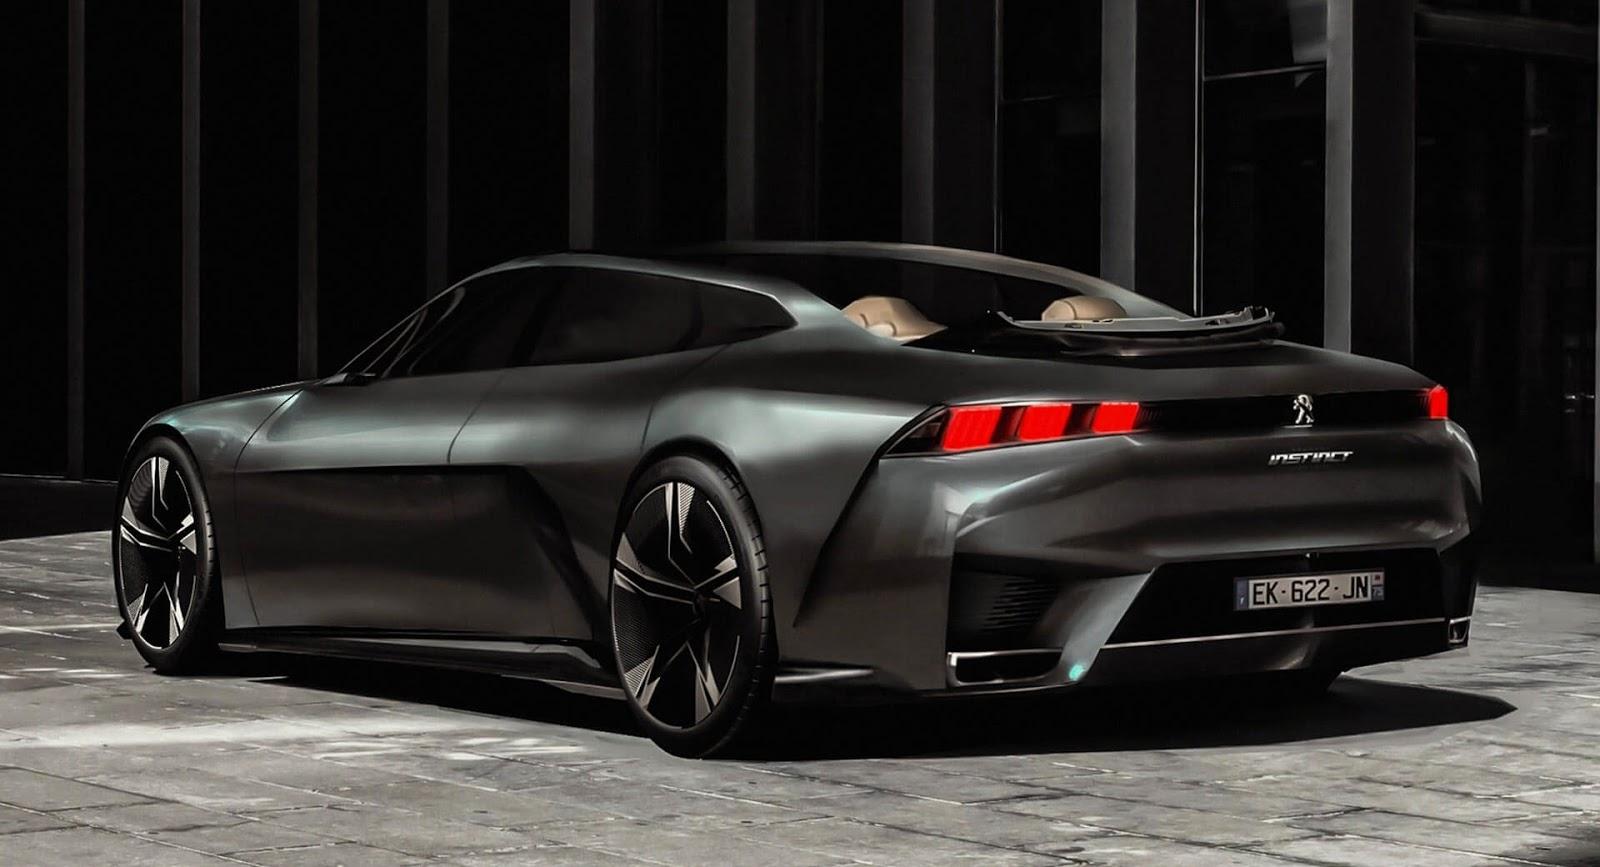 Peugeot Instinct Landaulet Render Looks Properly